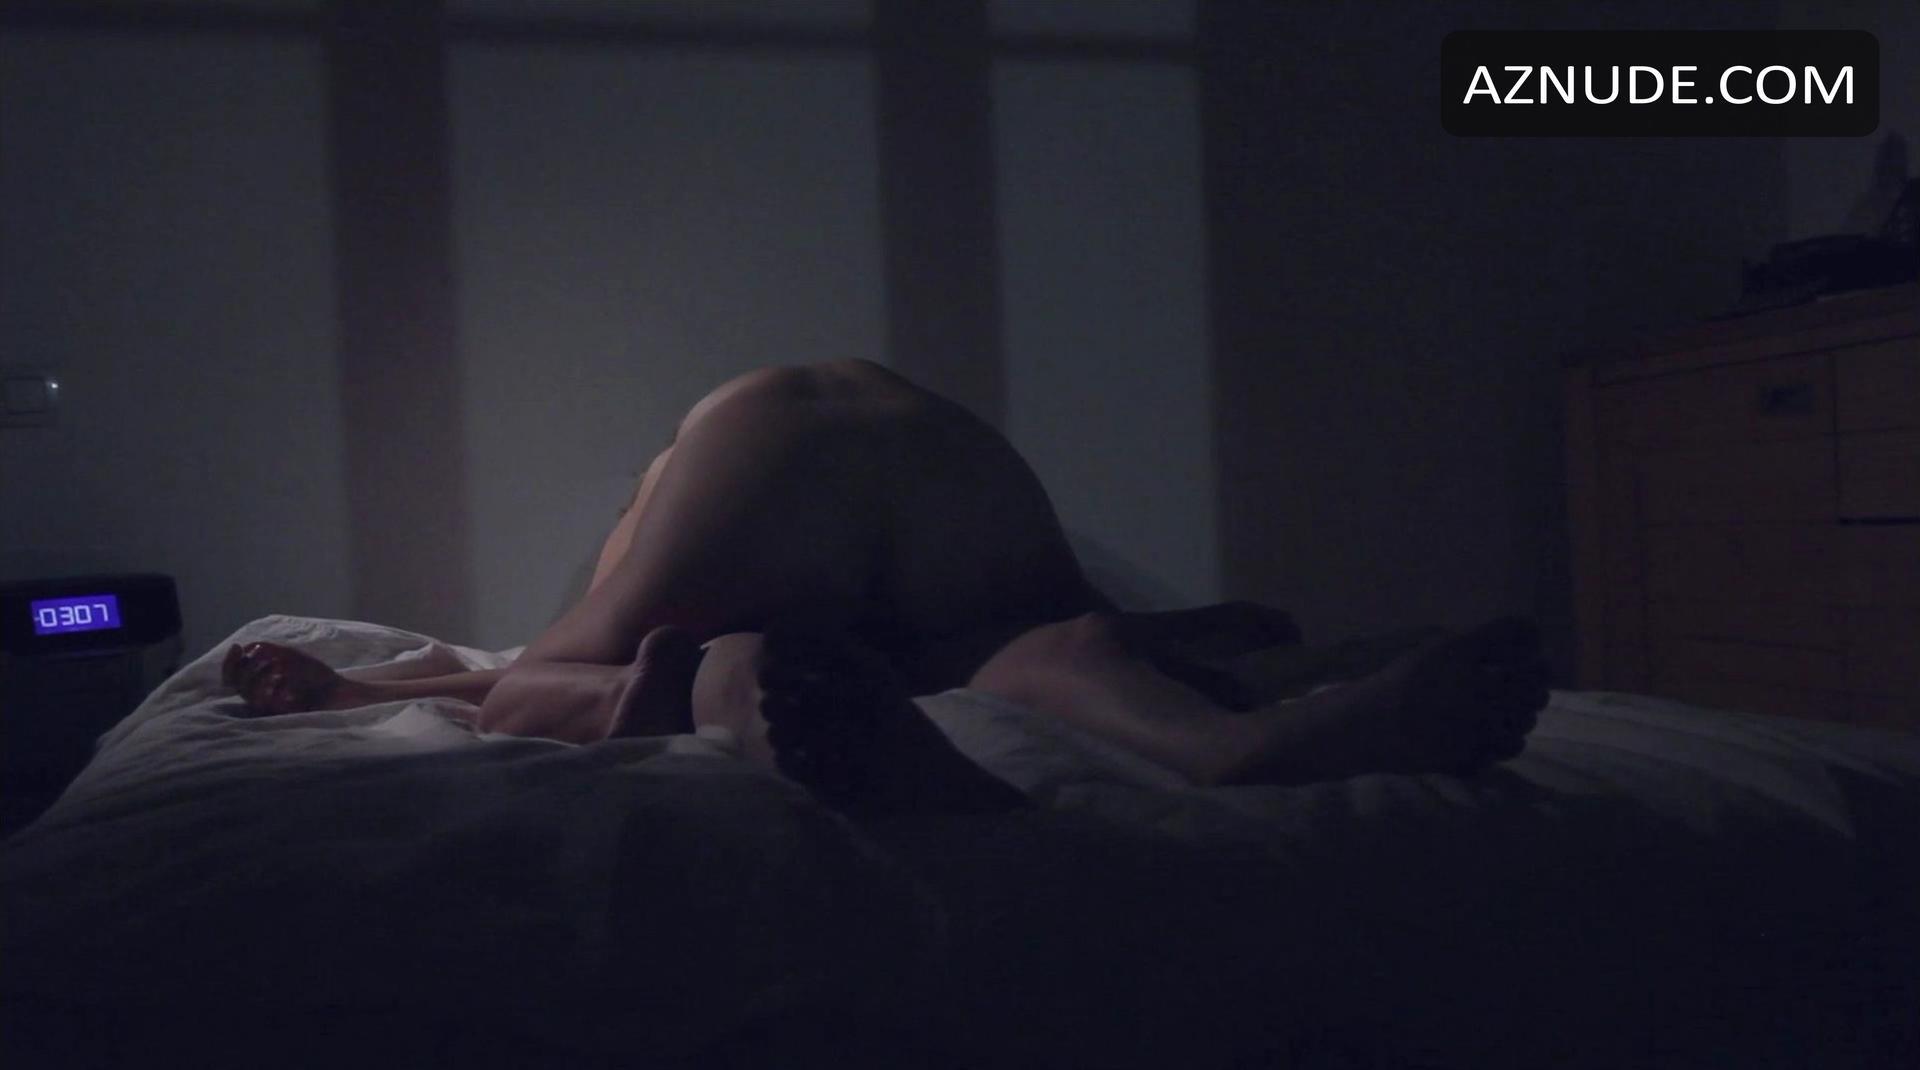 448 aurelie houguenade 2014 lesbian scenes - 2 part 8